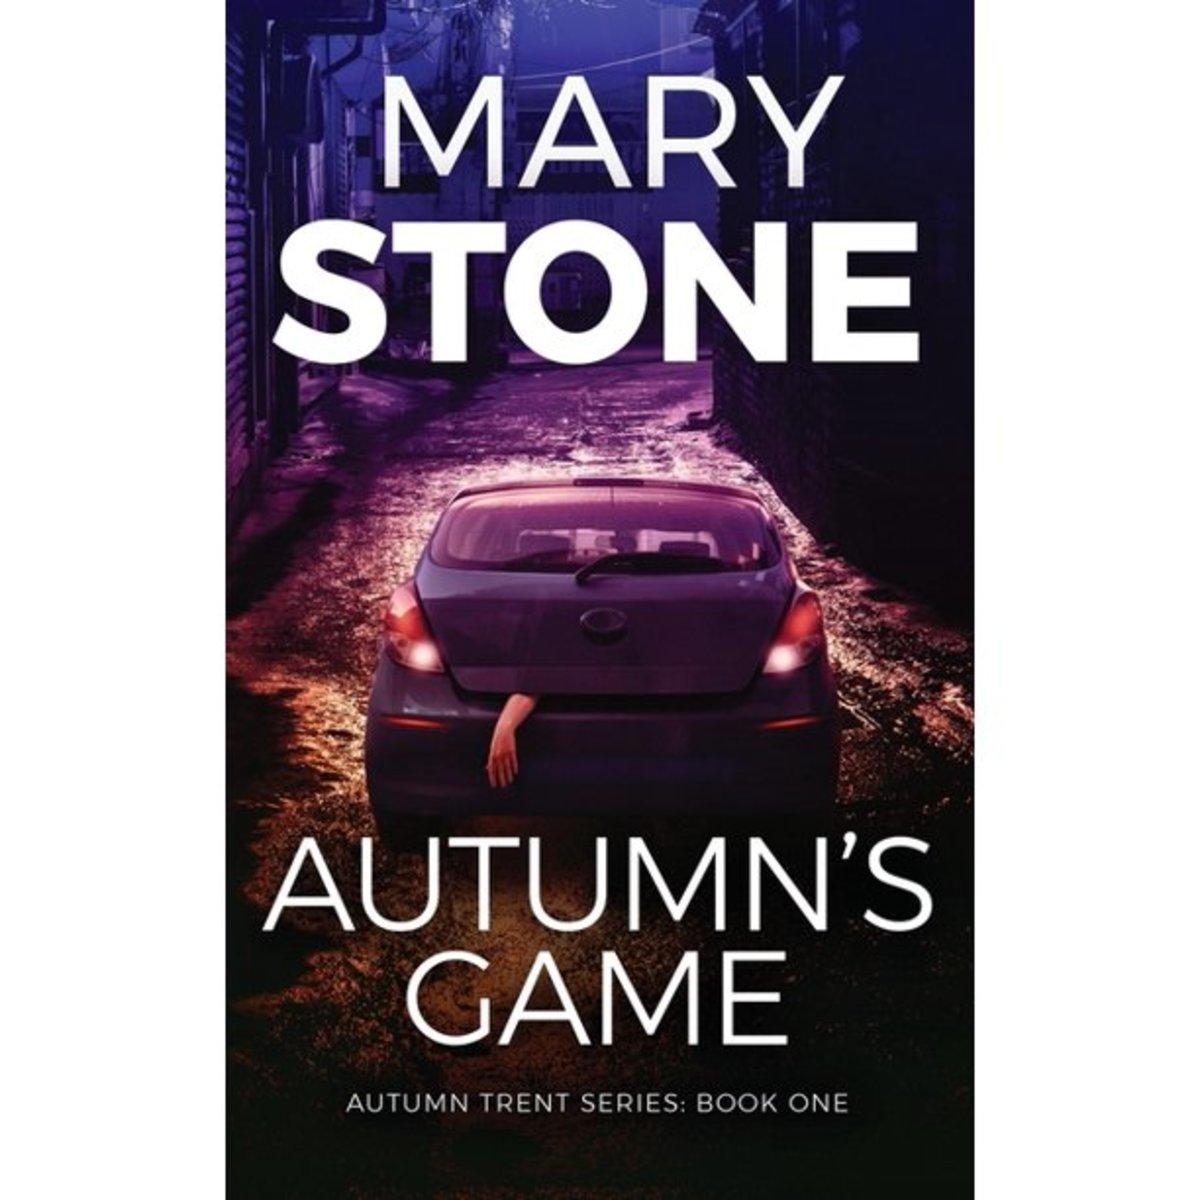 Book 1 of the Autumn Trent series